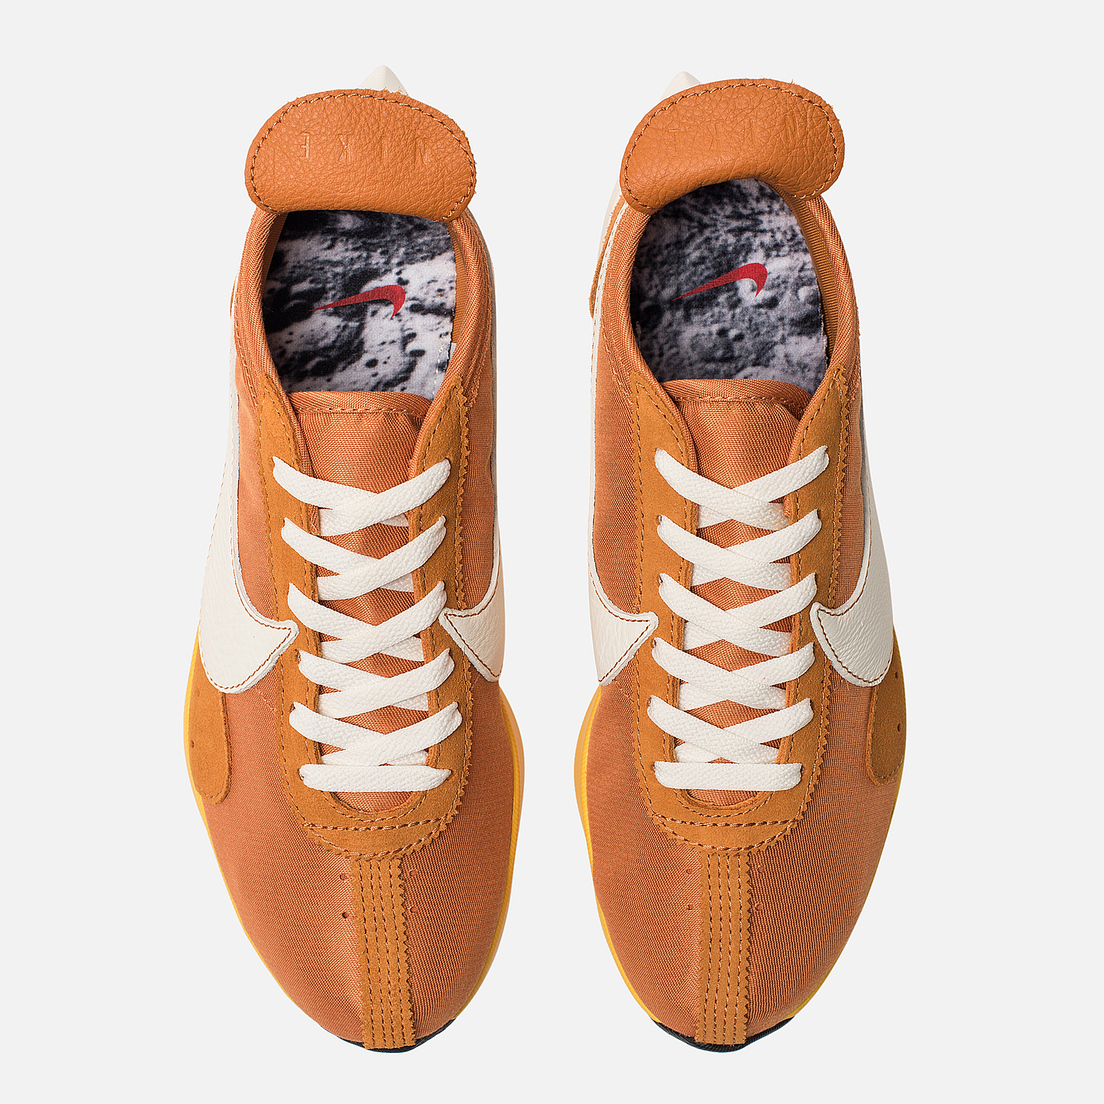 popular brecha manipular  Мужские кроссовки Nike Moon Racer QS BV7779-800